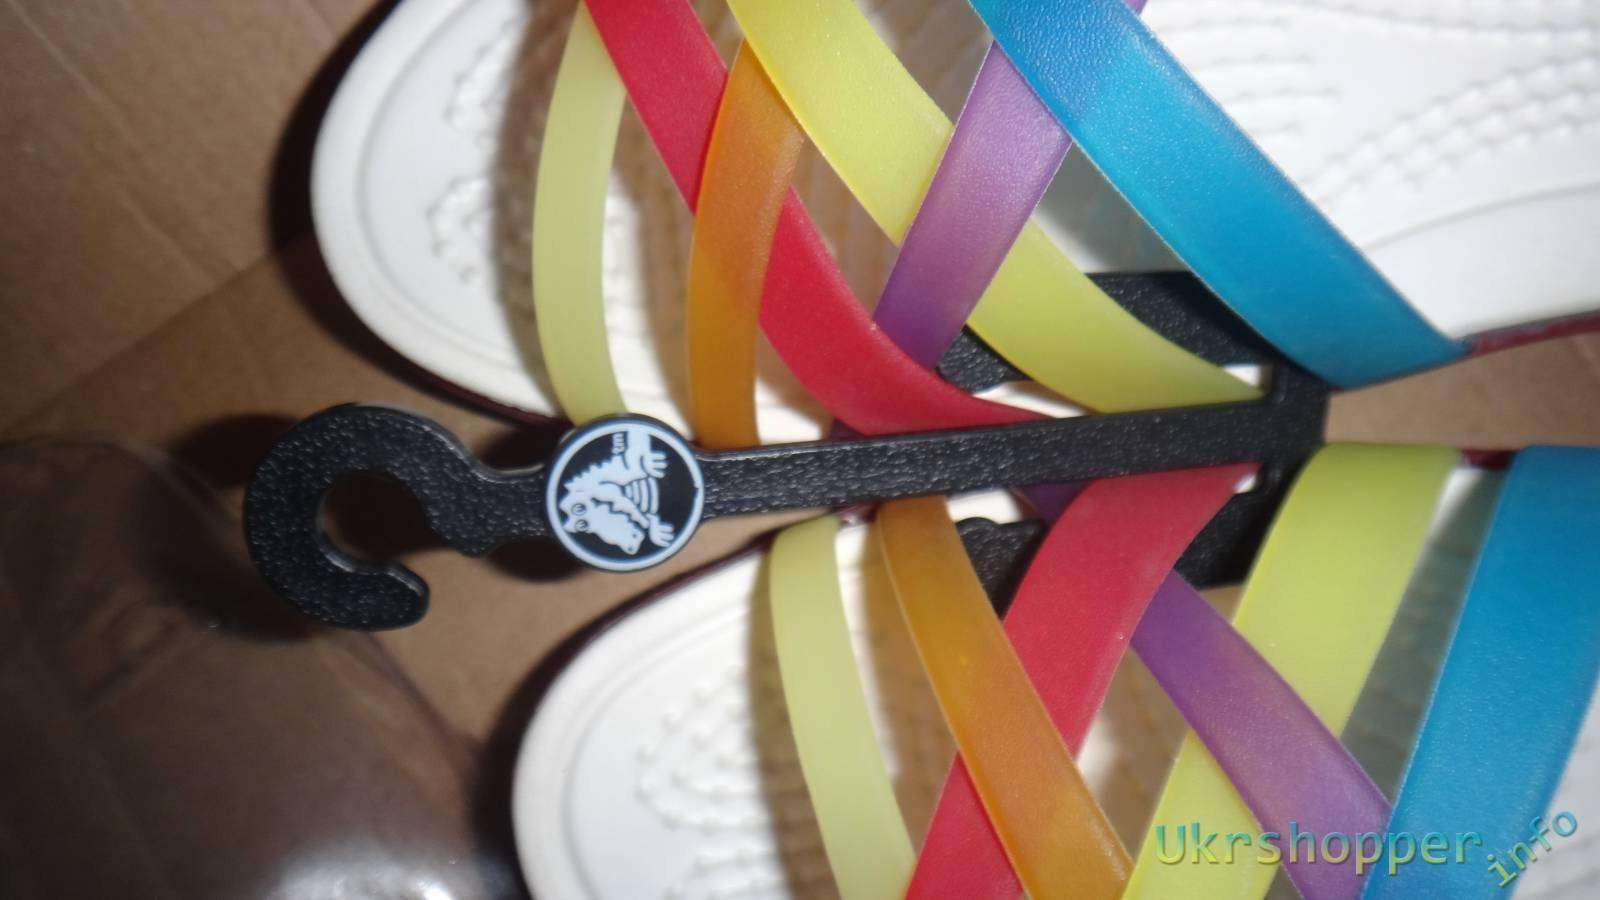 Обзо� жен�ки� бале�ок �и�м� crocs amazon shopper